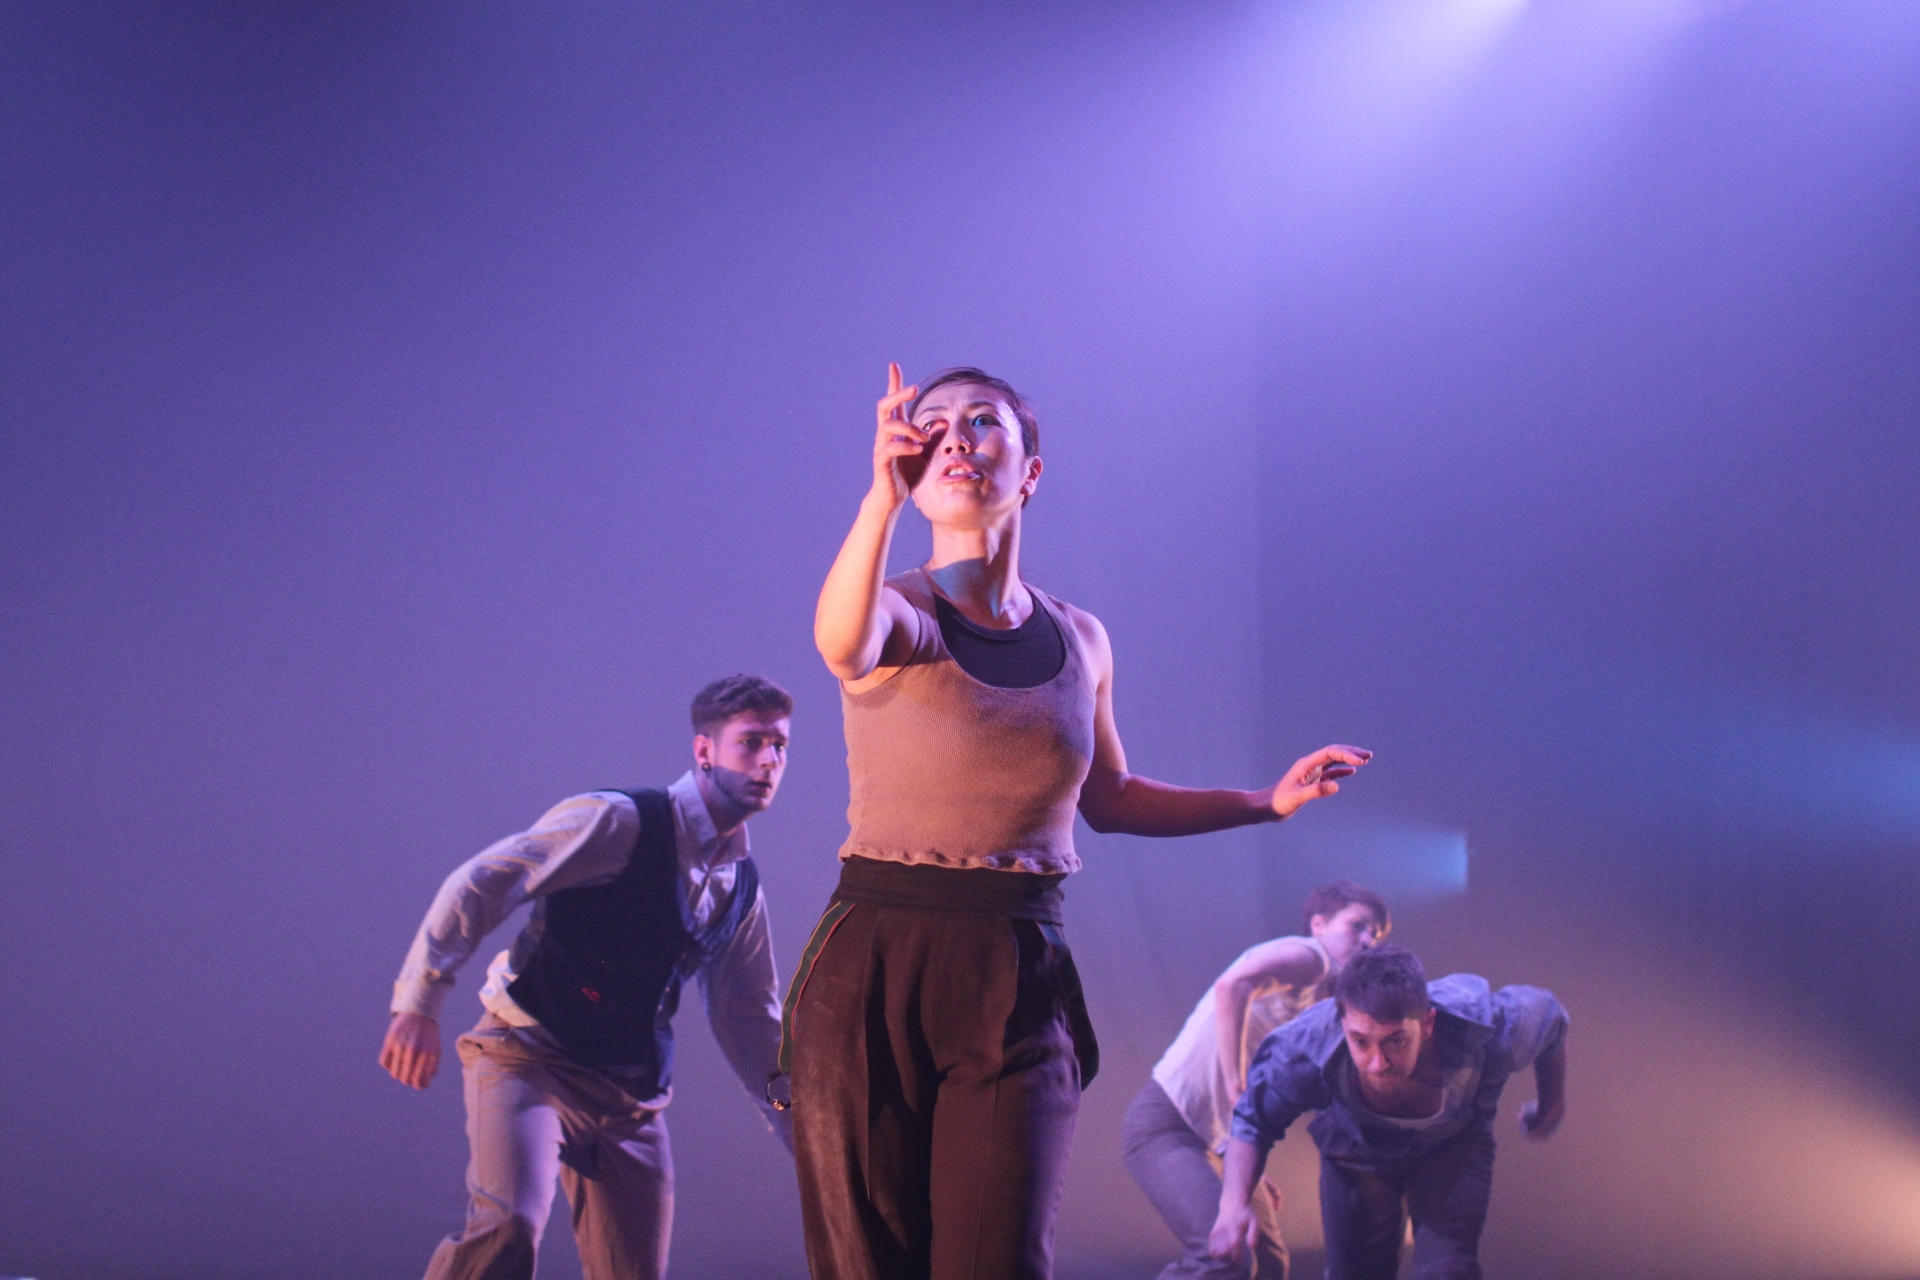 LÎLA DANCE: THE INCREDIBLE PRESENCE